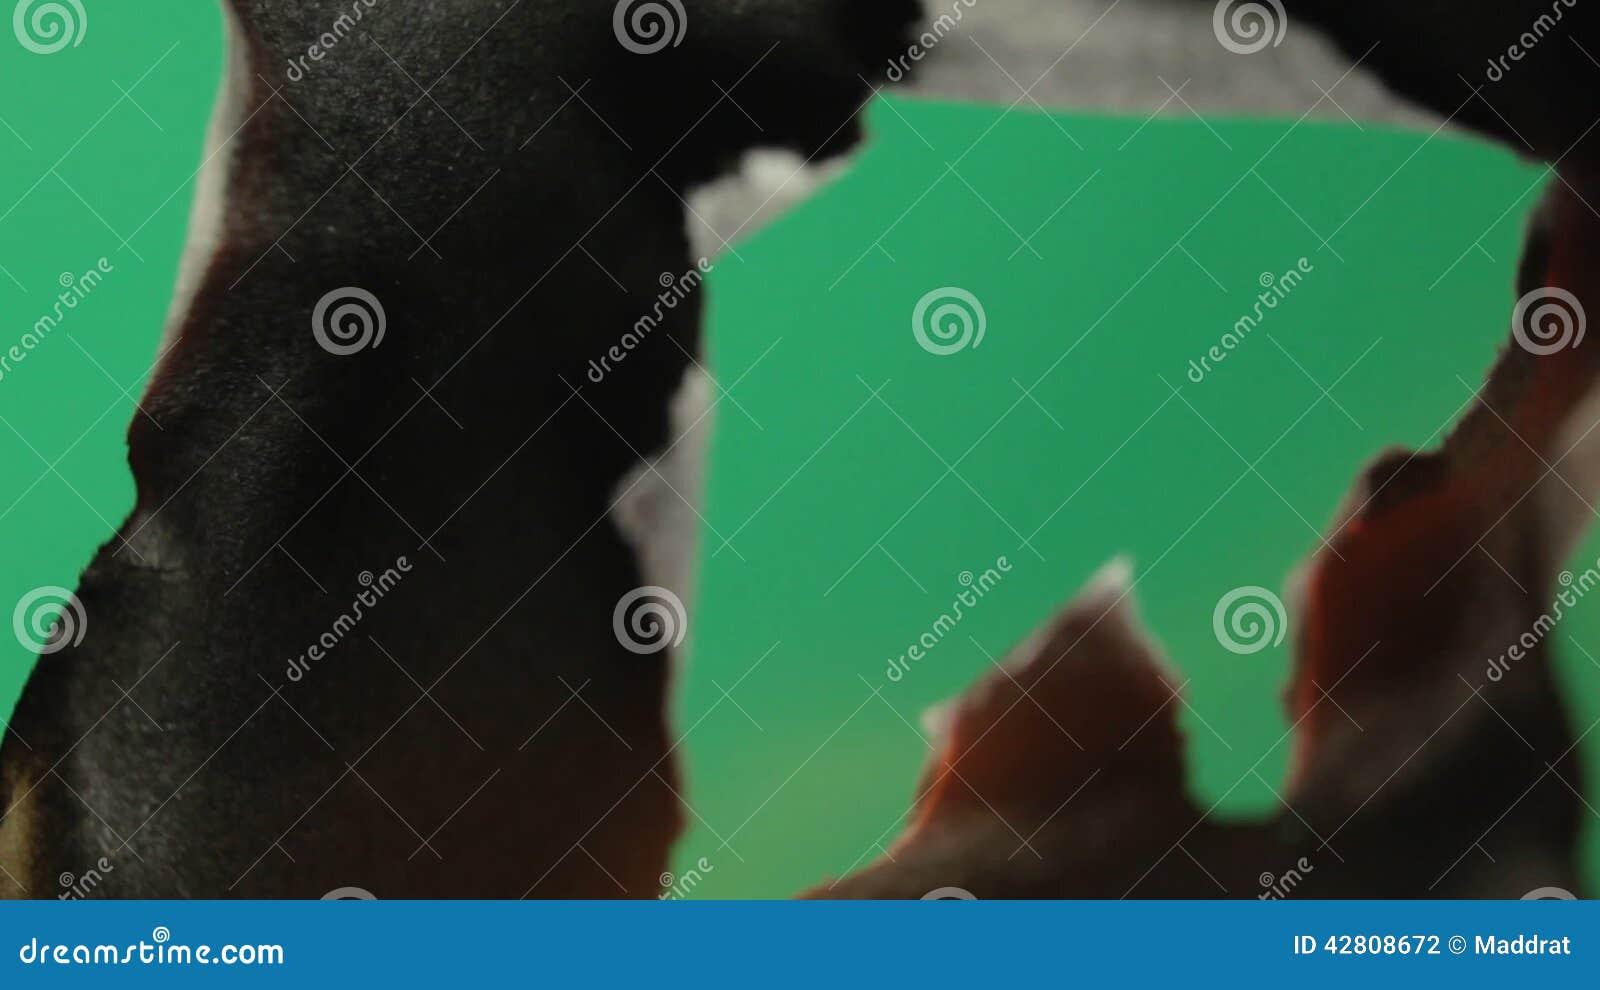 Fire & smoke green screen hd in free download   all design creative.